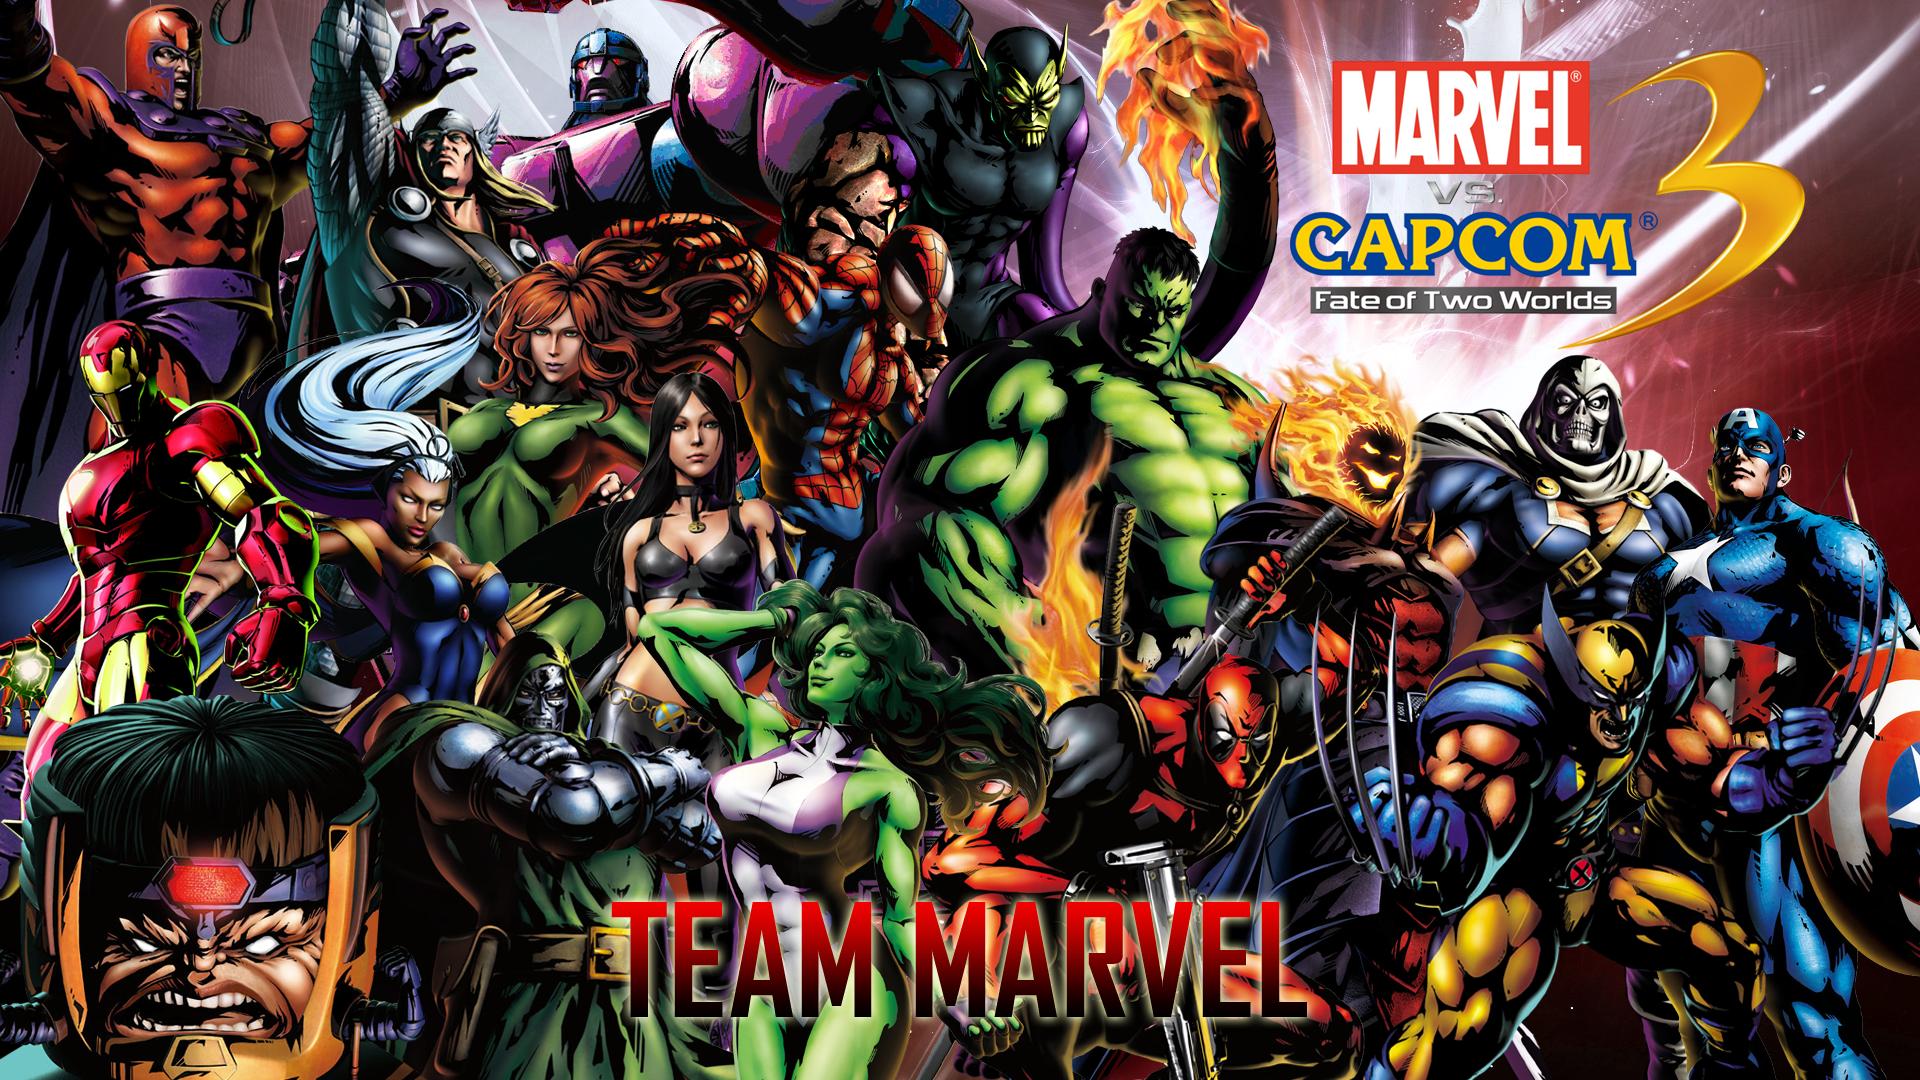 Marvel vs capcom 3 team marvel by crossdominatrix5 d33p16a